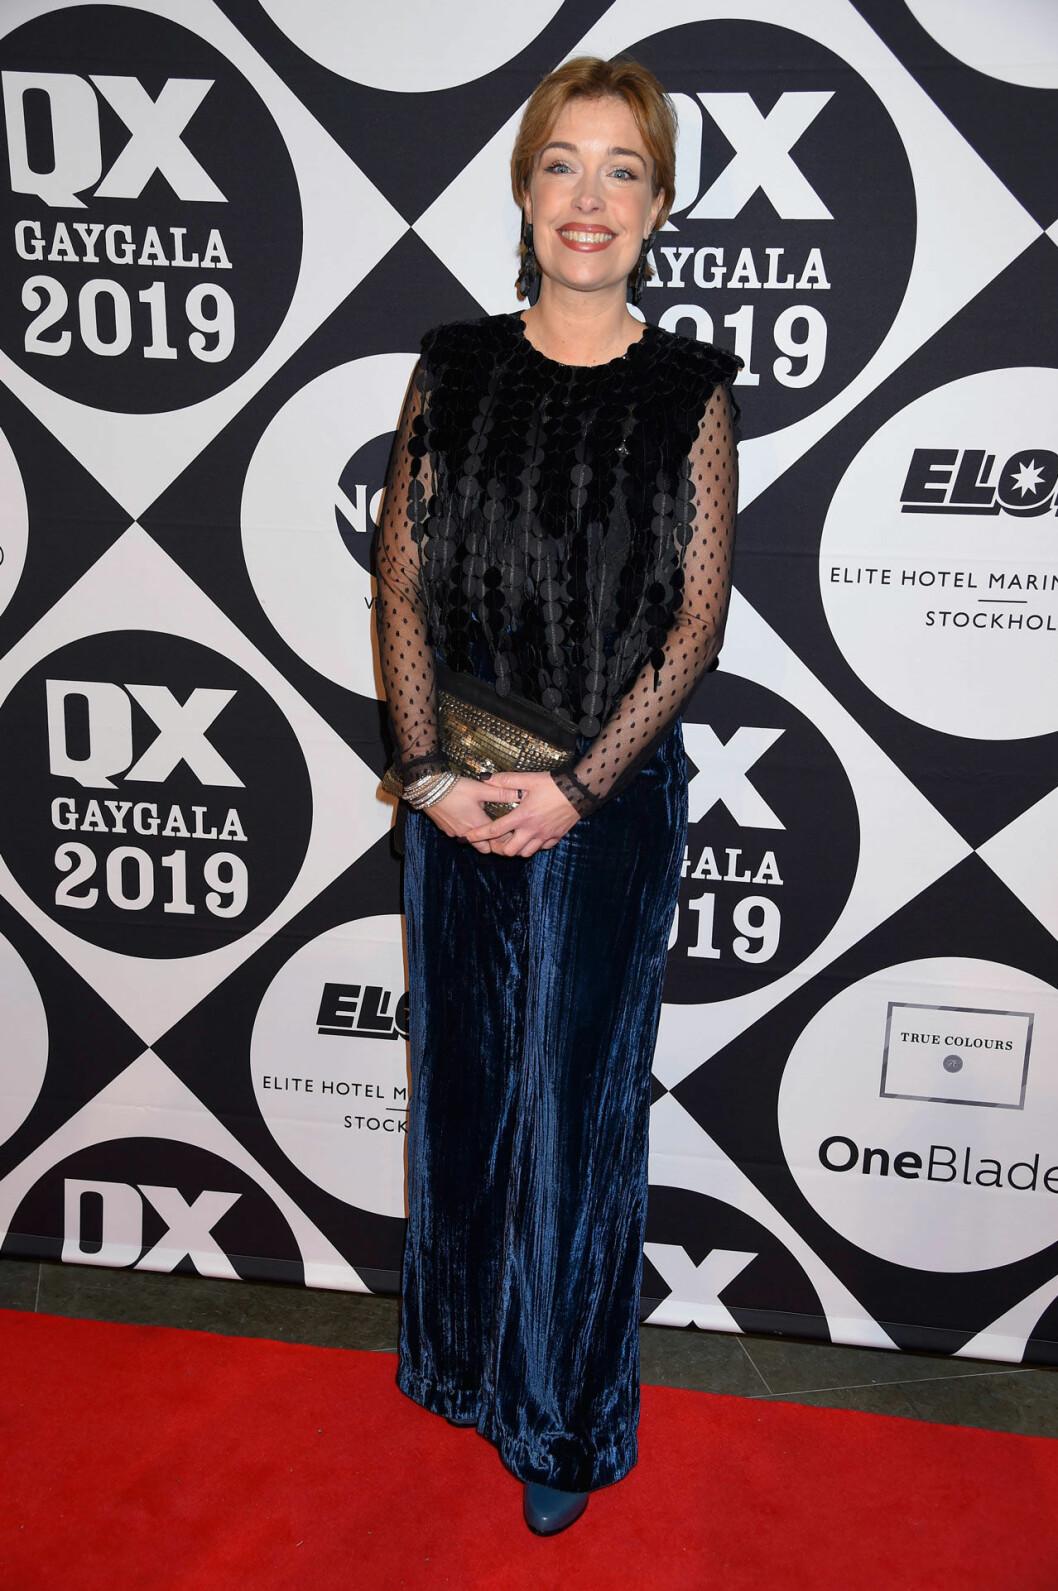 Annika Strandhäll på QX-galan 2019